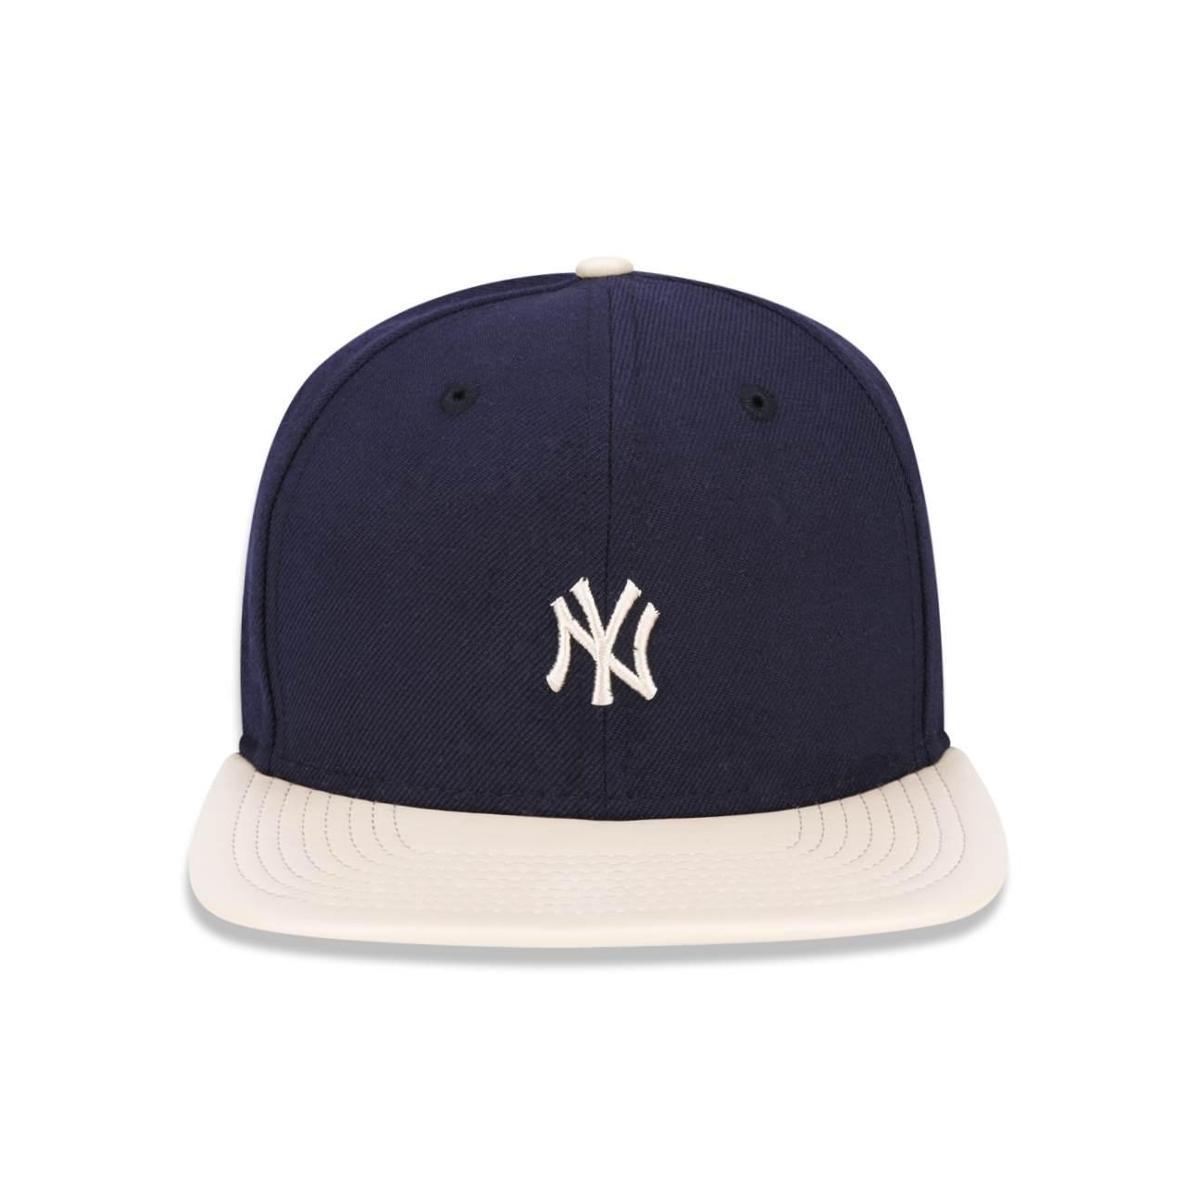 ... Boné 950 Original Fit New York Yankees MLB Aba Reta Snapback New Era ... 0ddc5e58971